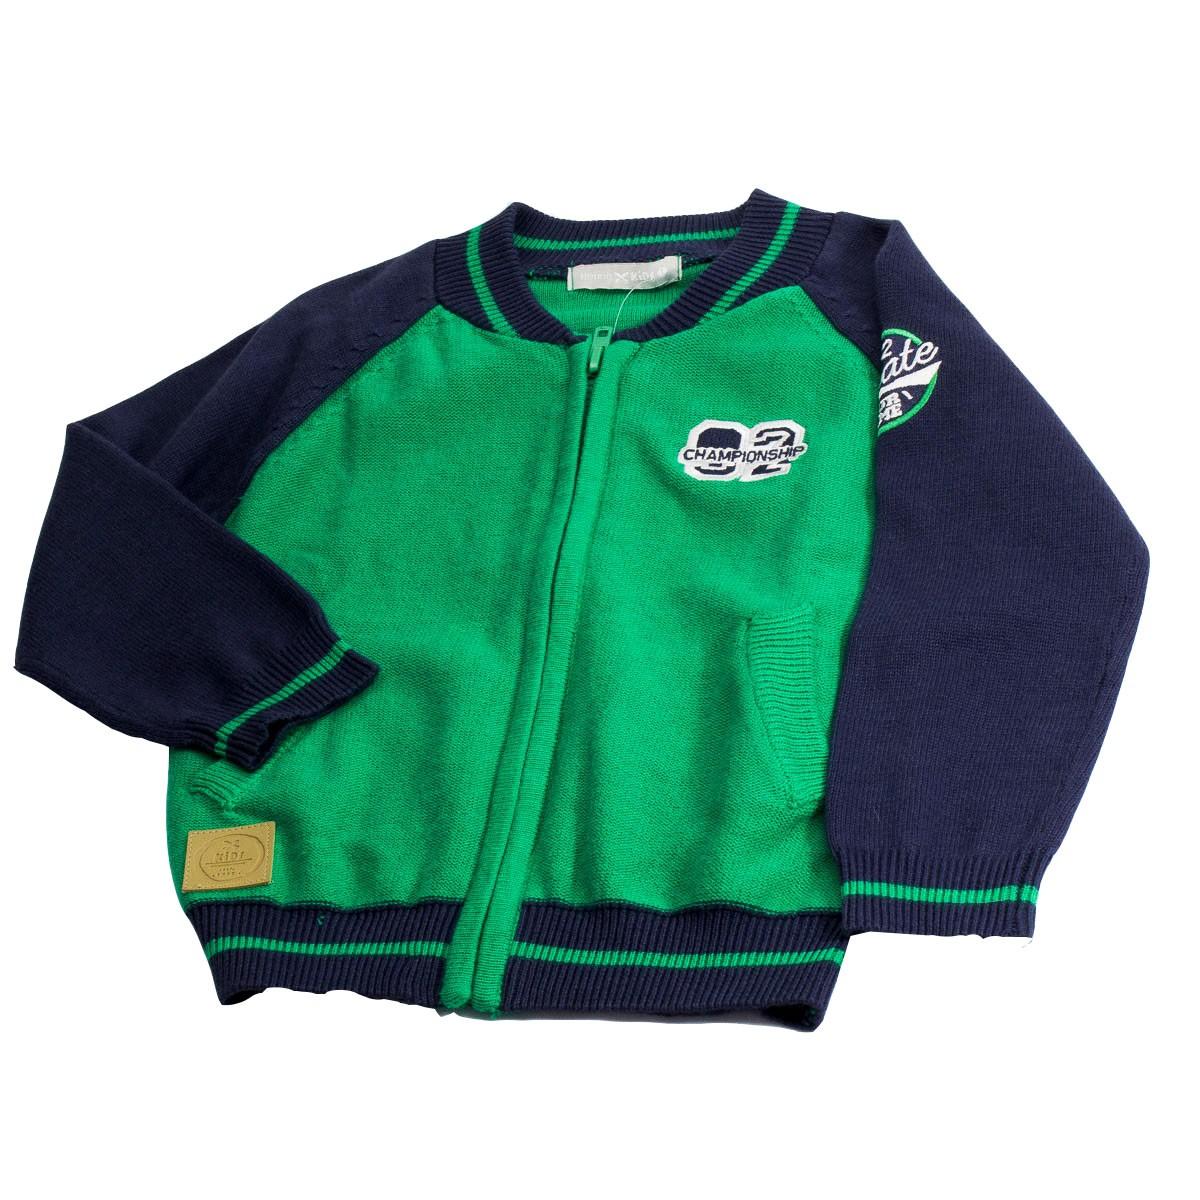 ee8633d8e7 Bizz Store - Jaqueta Infantil Masculina Hering Kids Moletom